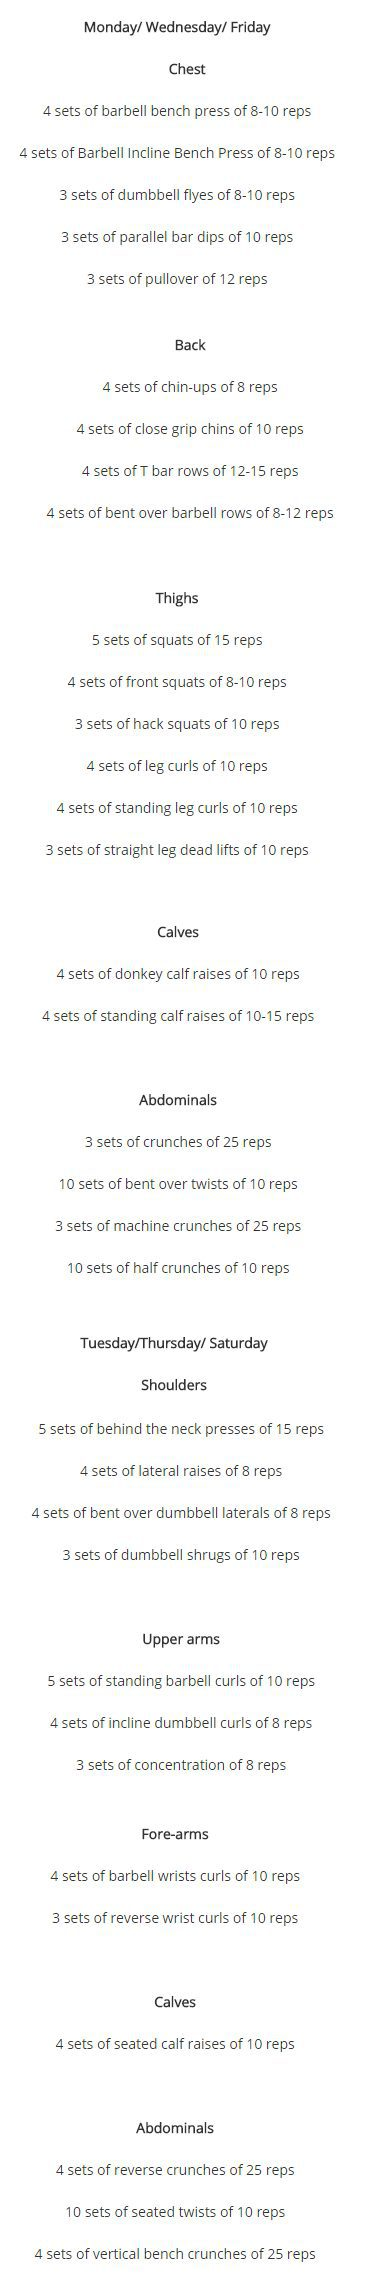 van damme workout routine